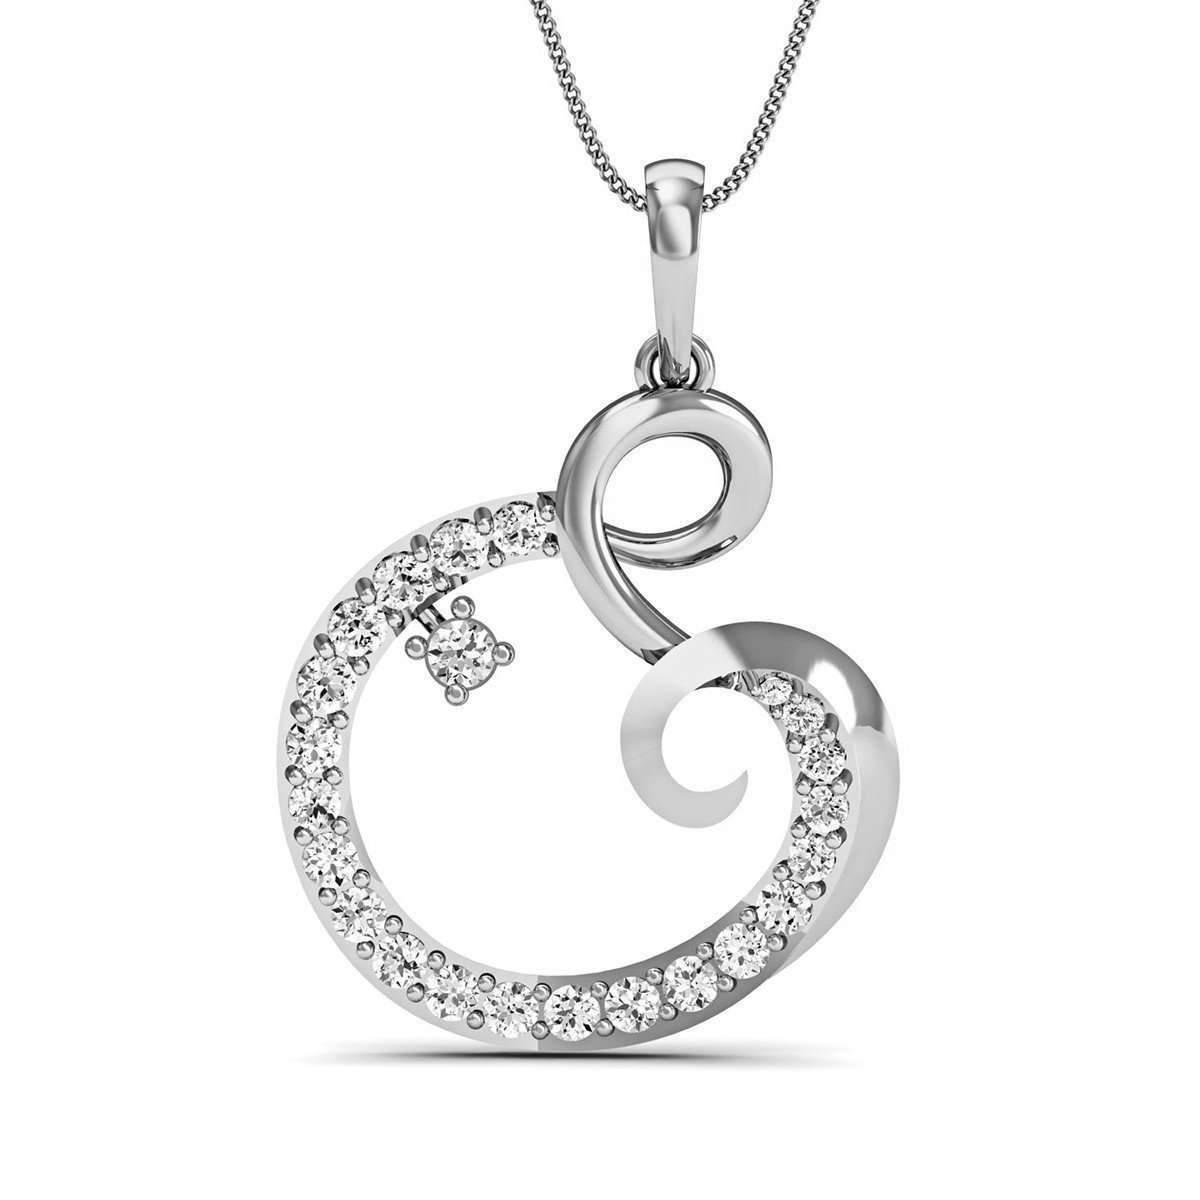 Diamoire Jewels Excellent Cut Diamond and 14kt White Gold Pave Pendant FRQA2Bna1